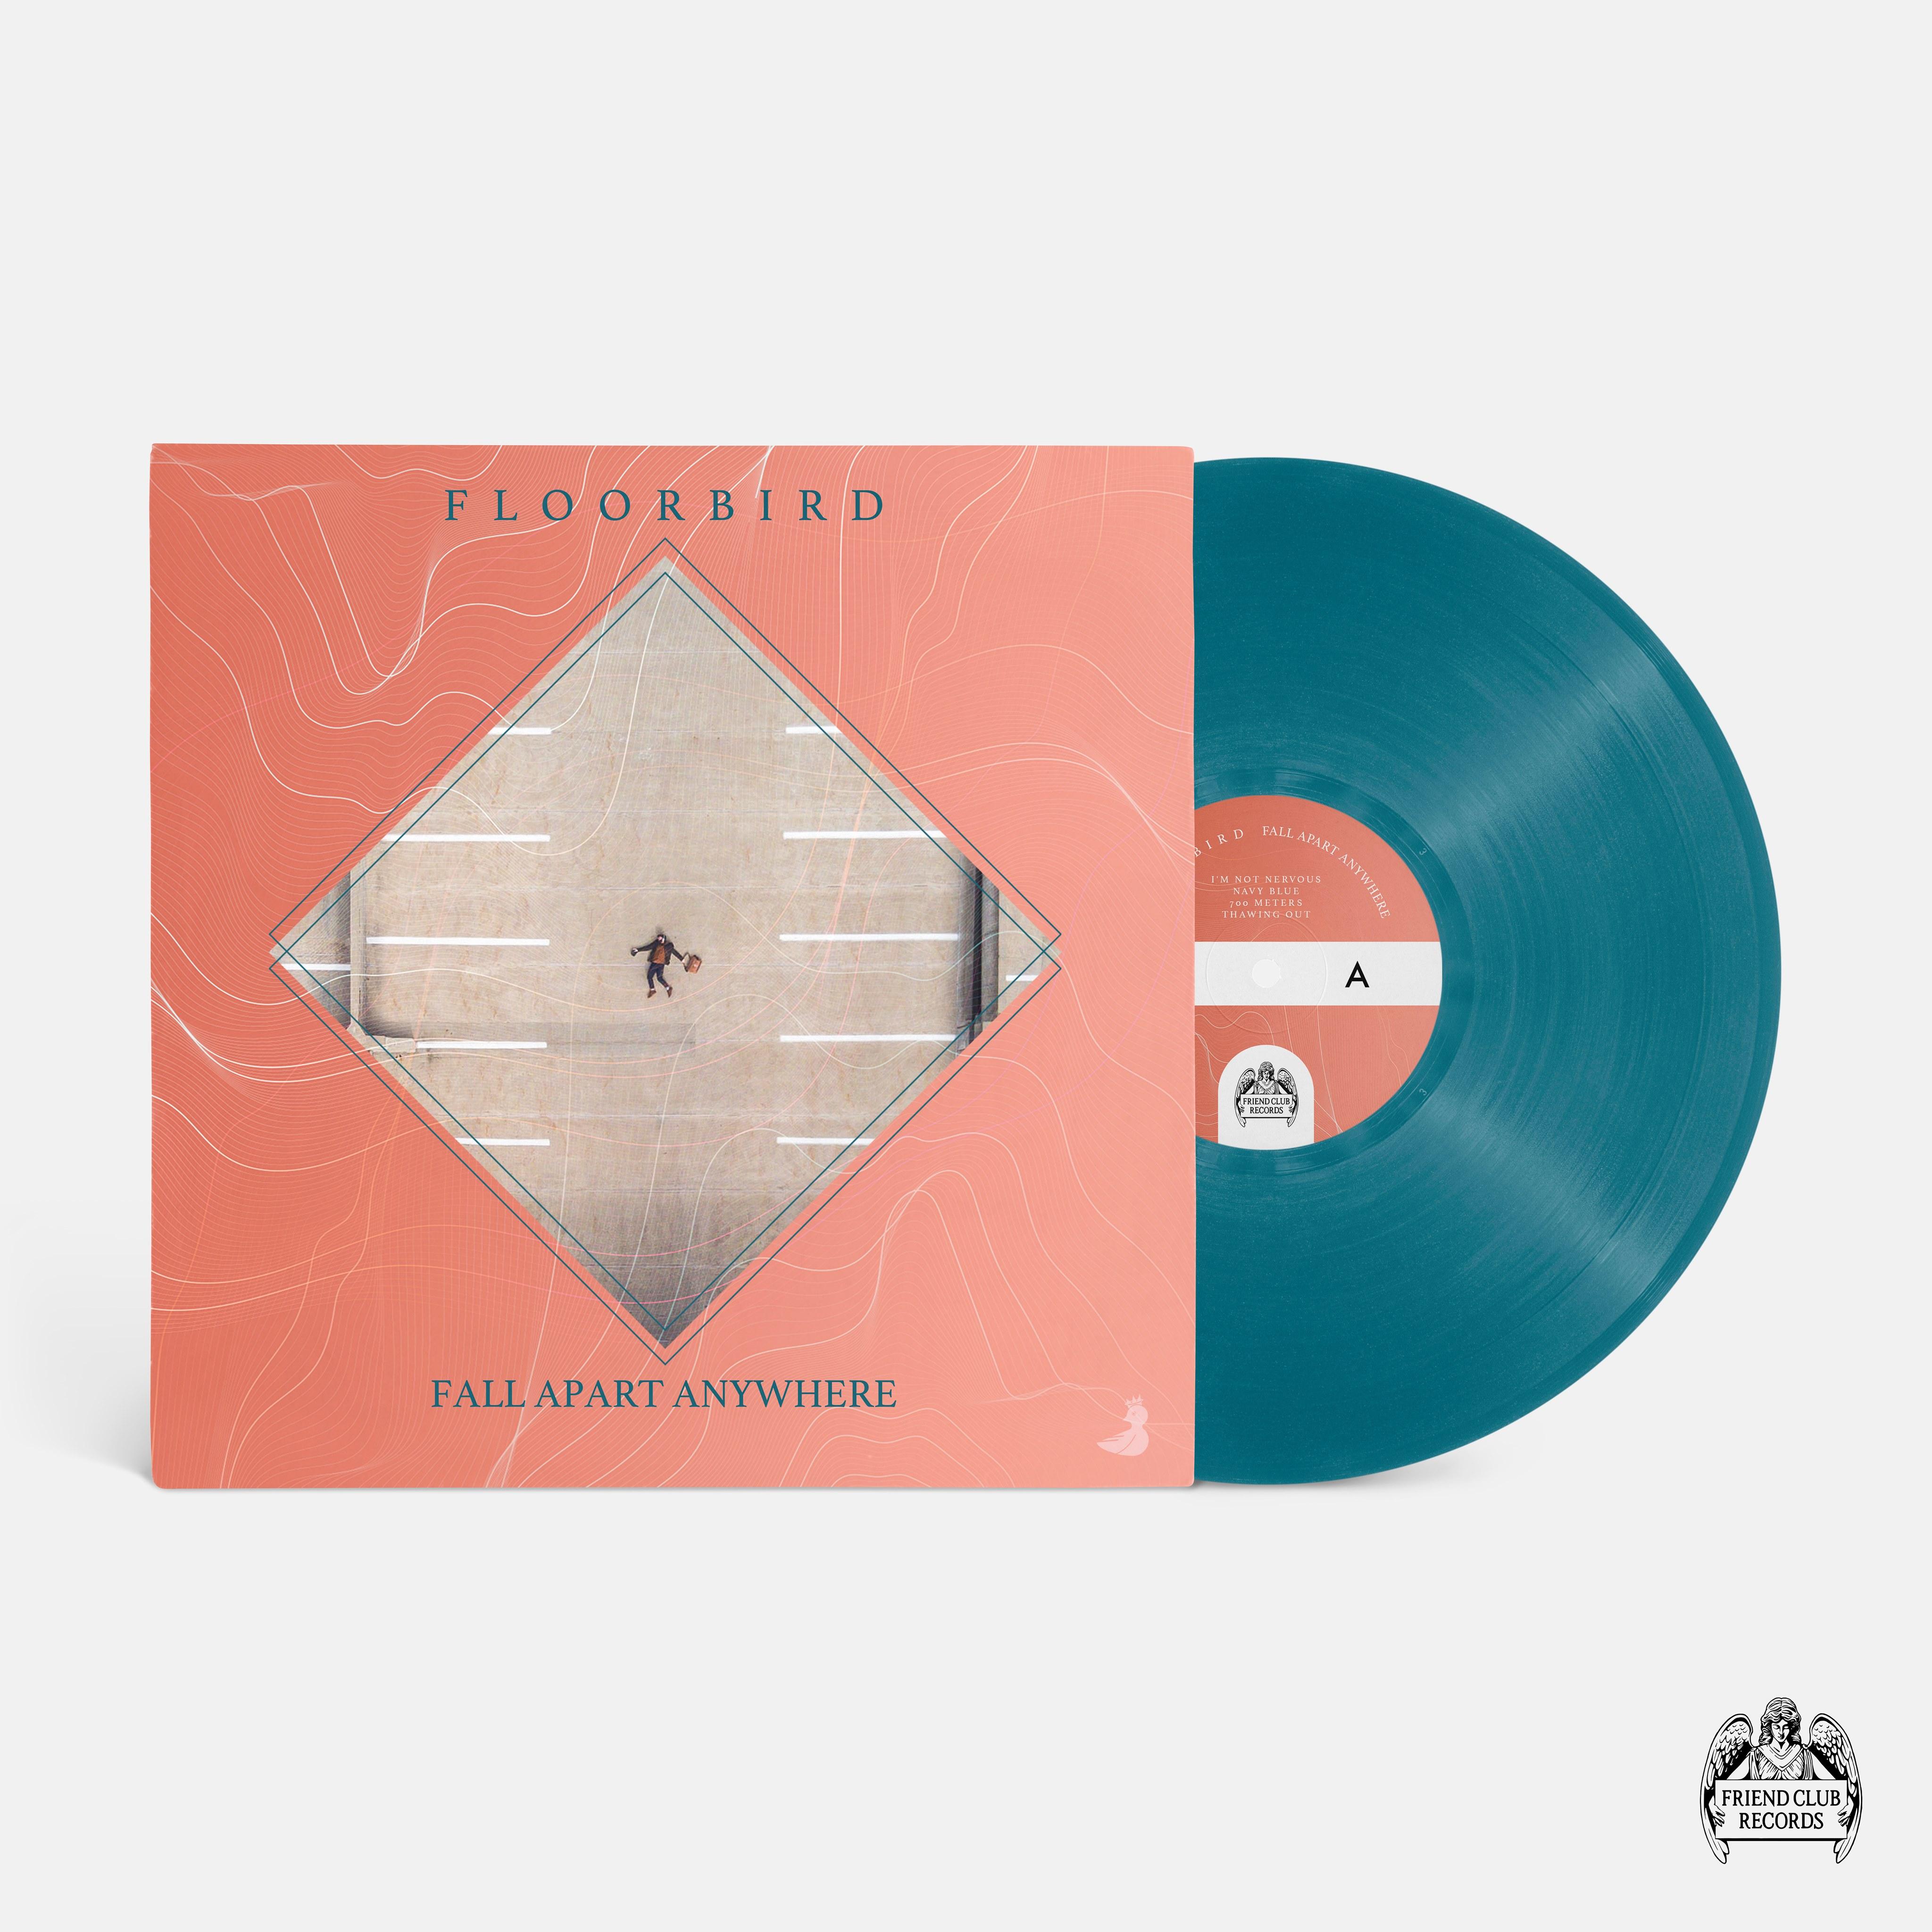 Floorbird - Fall Apart Anywhere